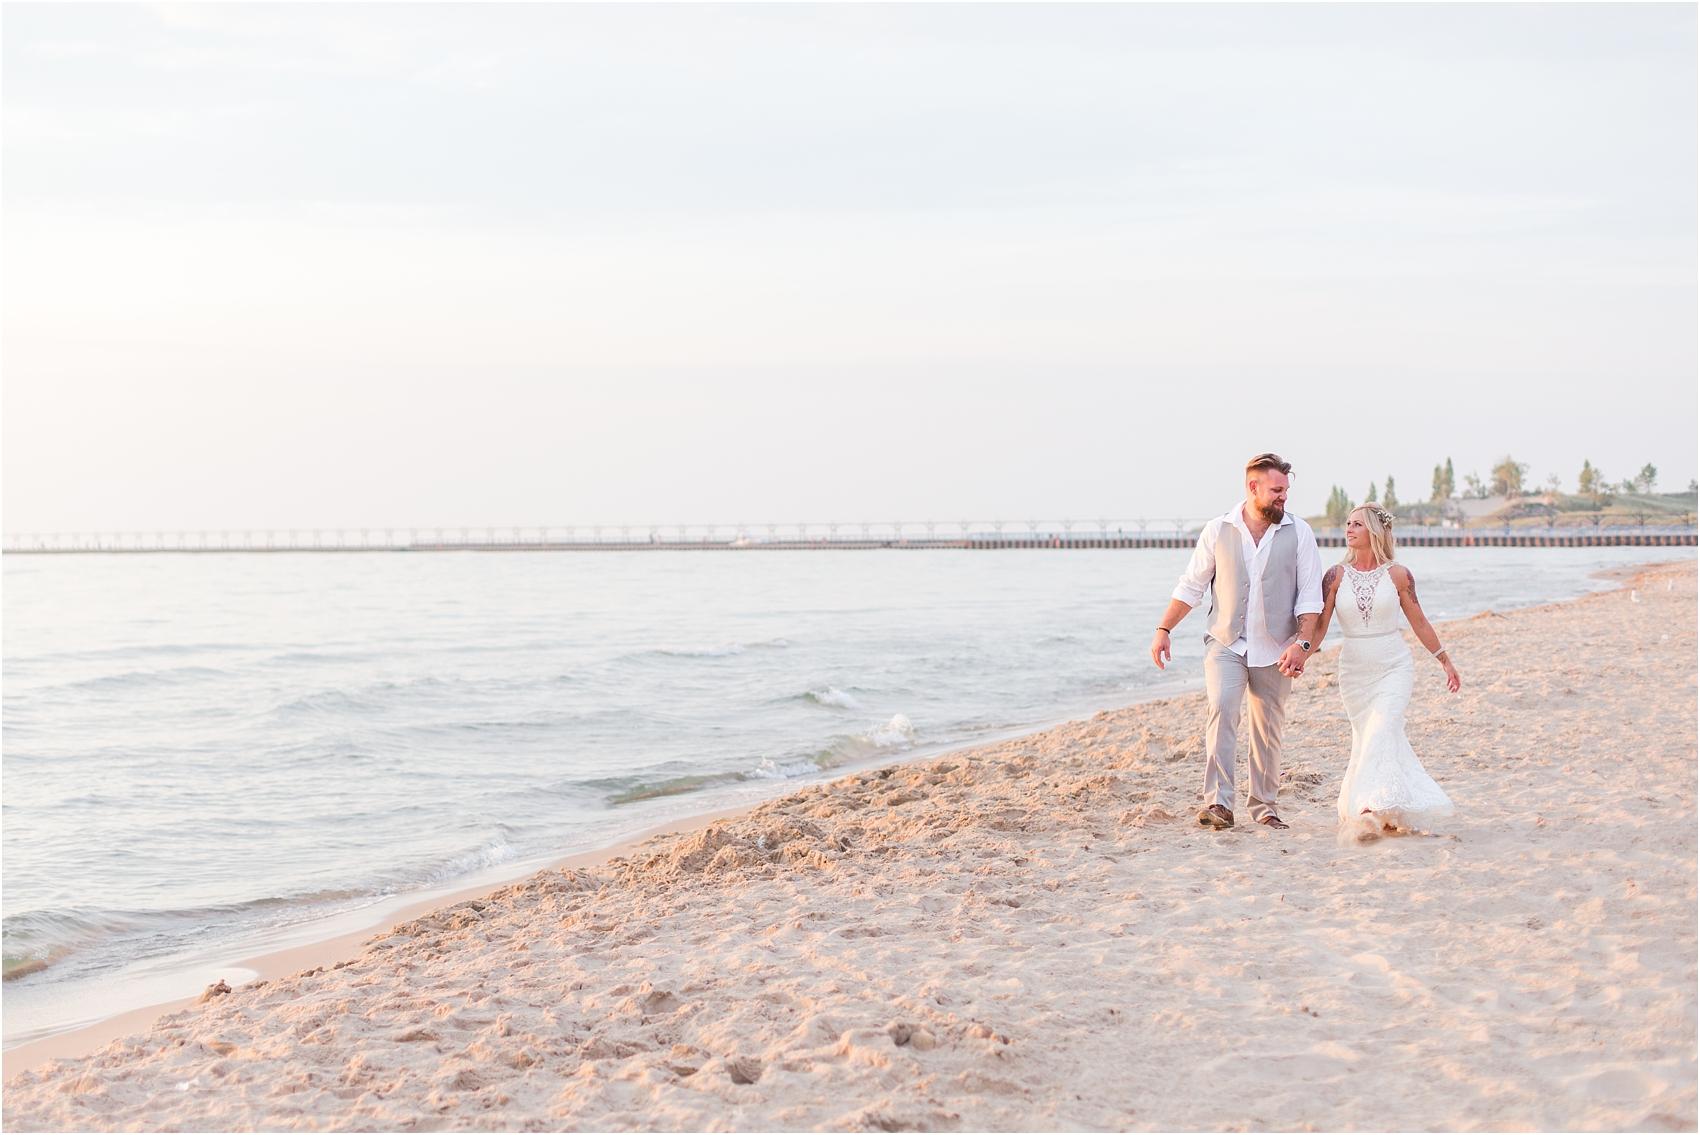 fun-whimsical-beach-wedding-photos-in-st-joseph-michigan-by-courtney-carolyn-photography_0098.jpg